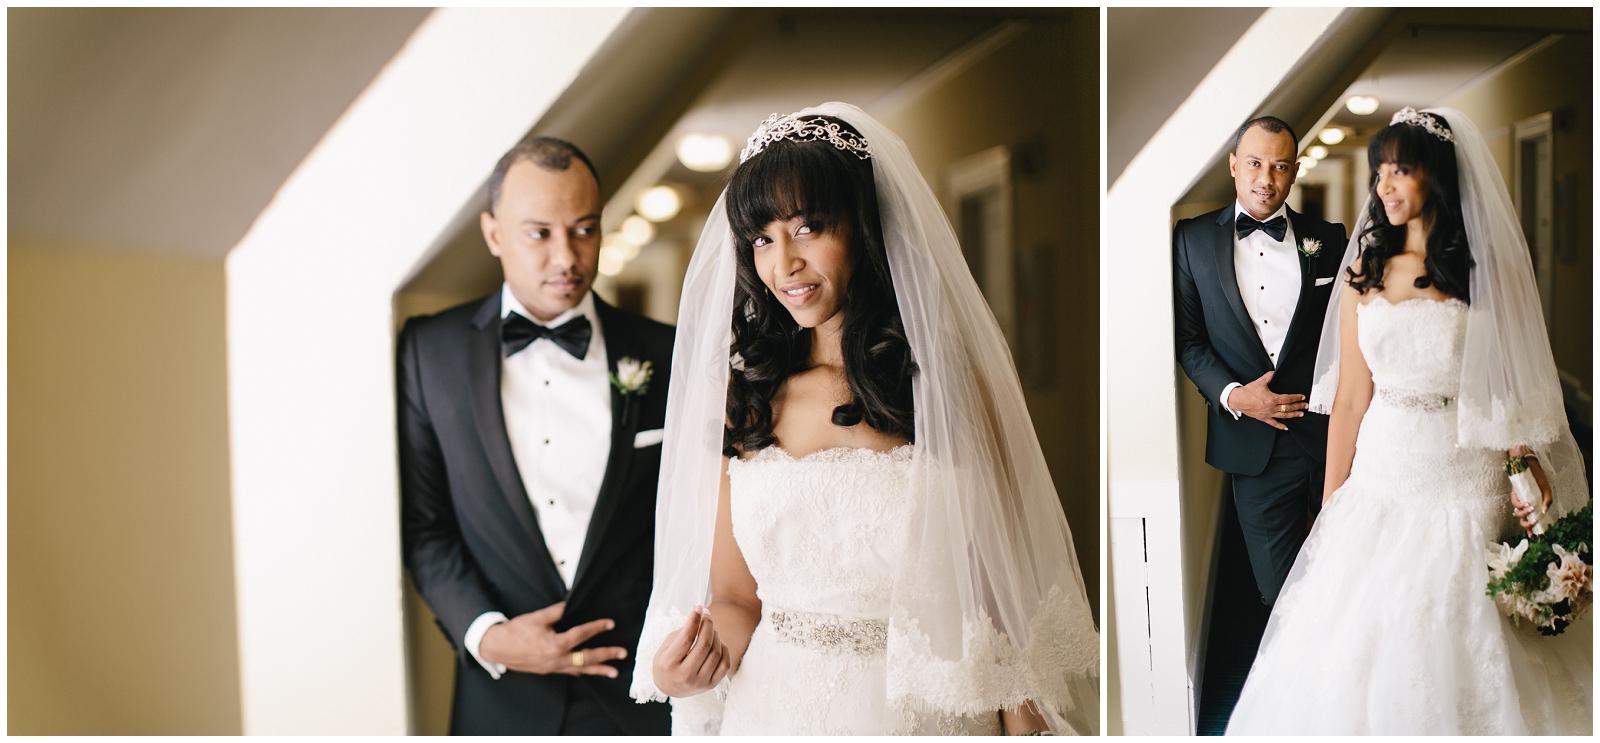 San-Francisco-Bay-Area-Wedding-Photography-Claremont-Hotel-7.jpg